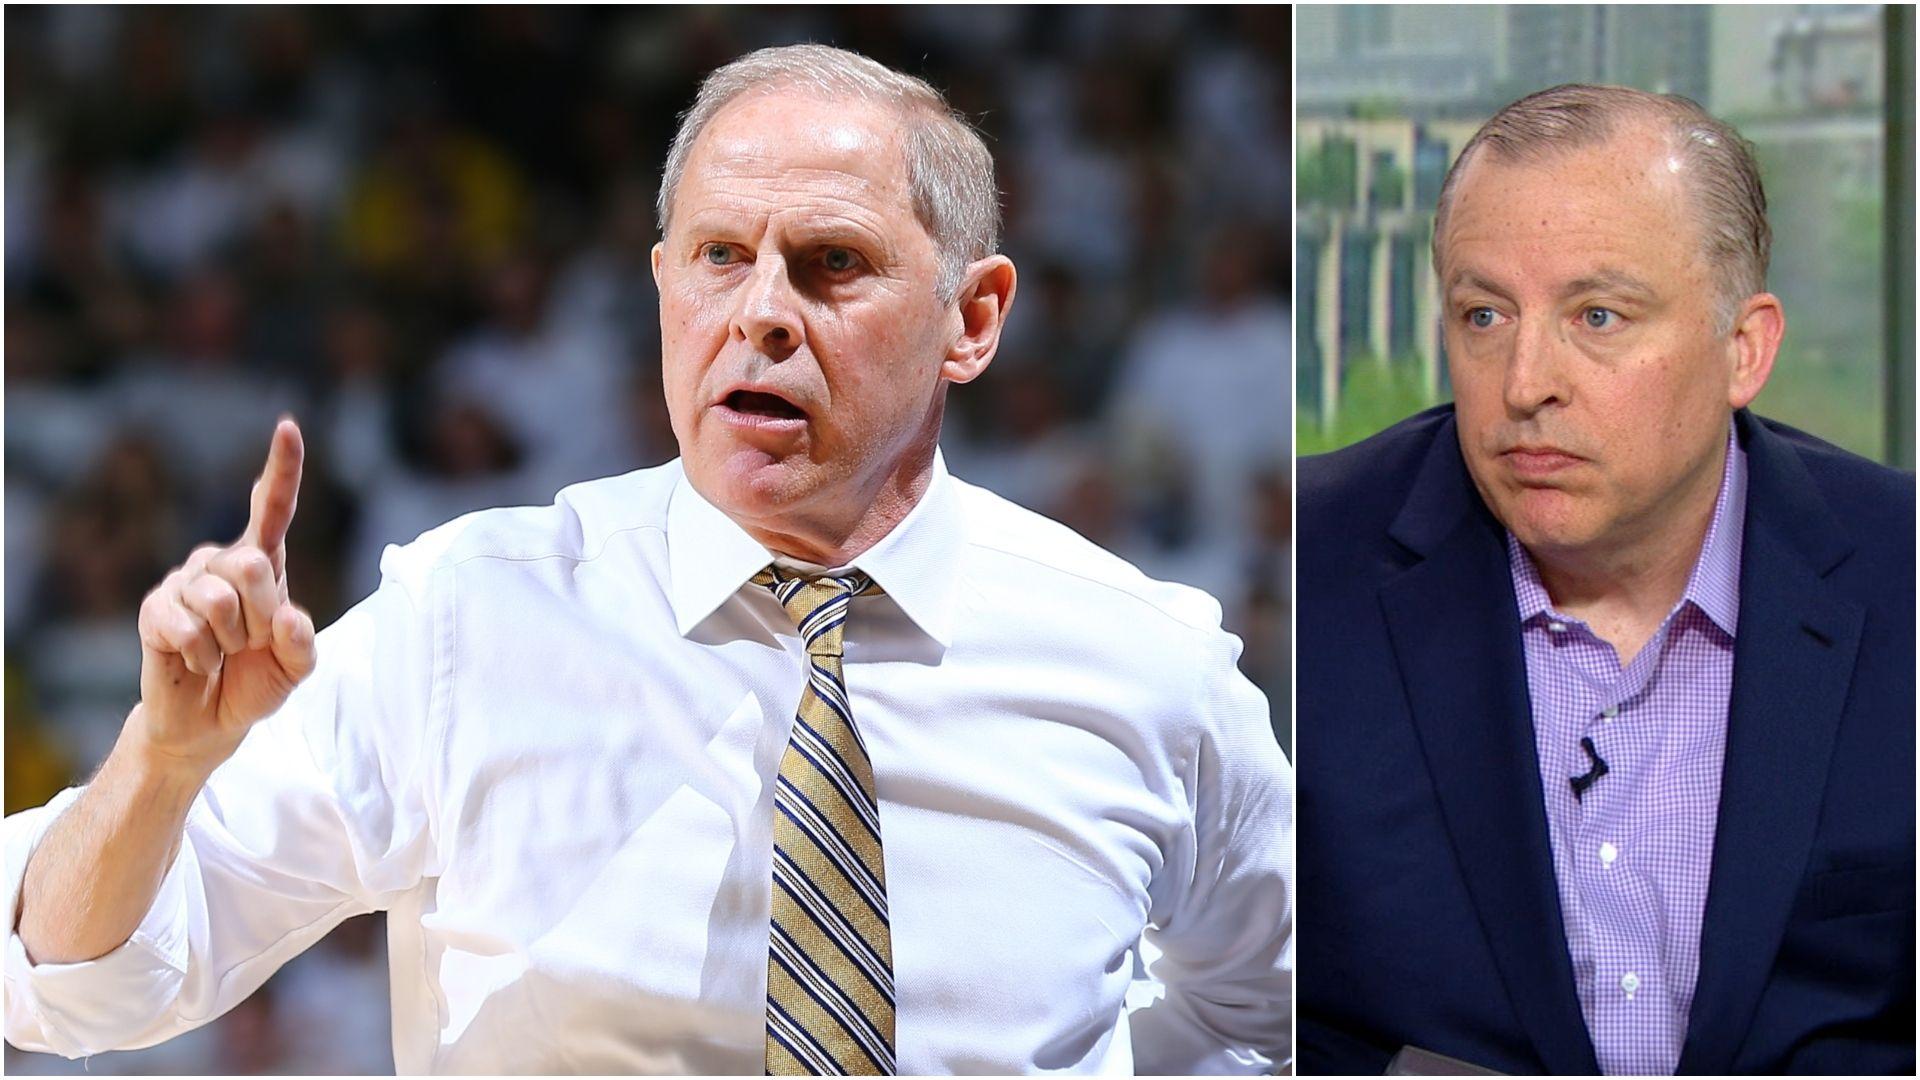 Sources: Michigan's Beilein to coach Cavaliers